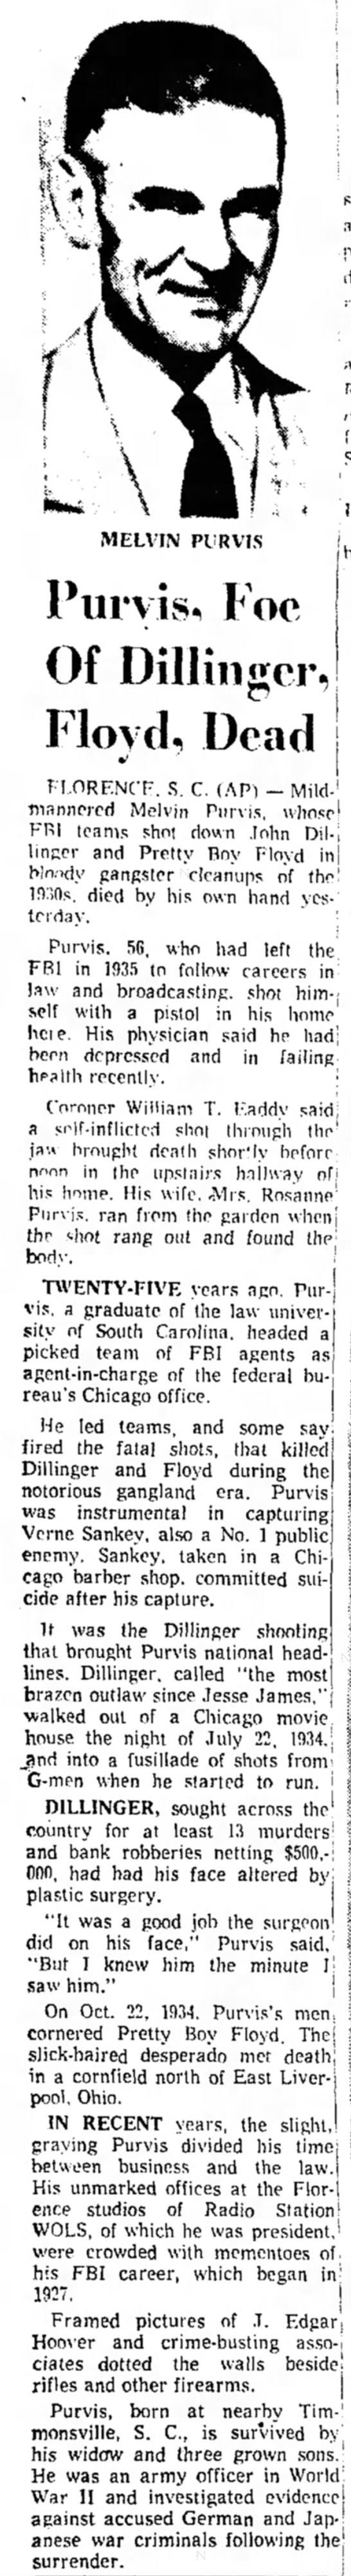 Arizona Republic, Phoenix, Arizona, Tuesday, March 1, 1960 -